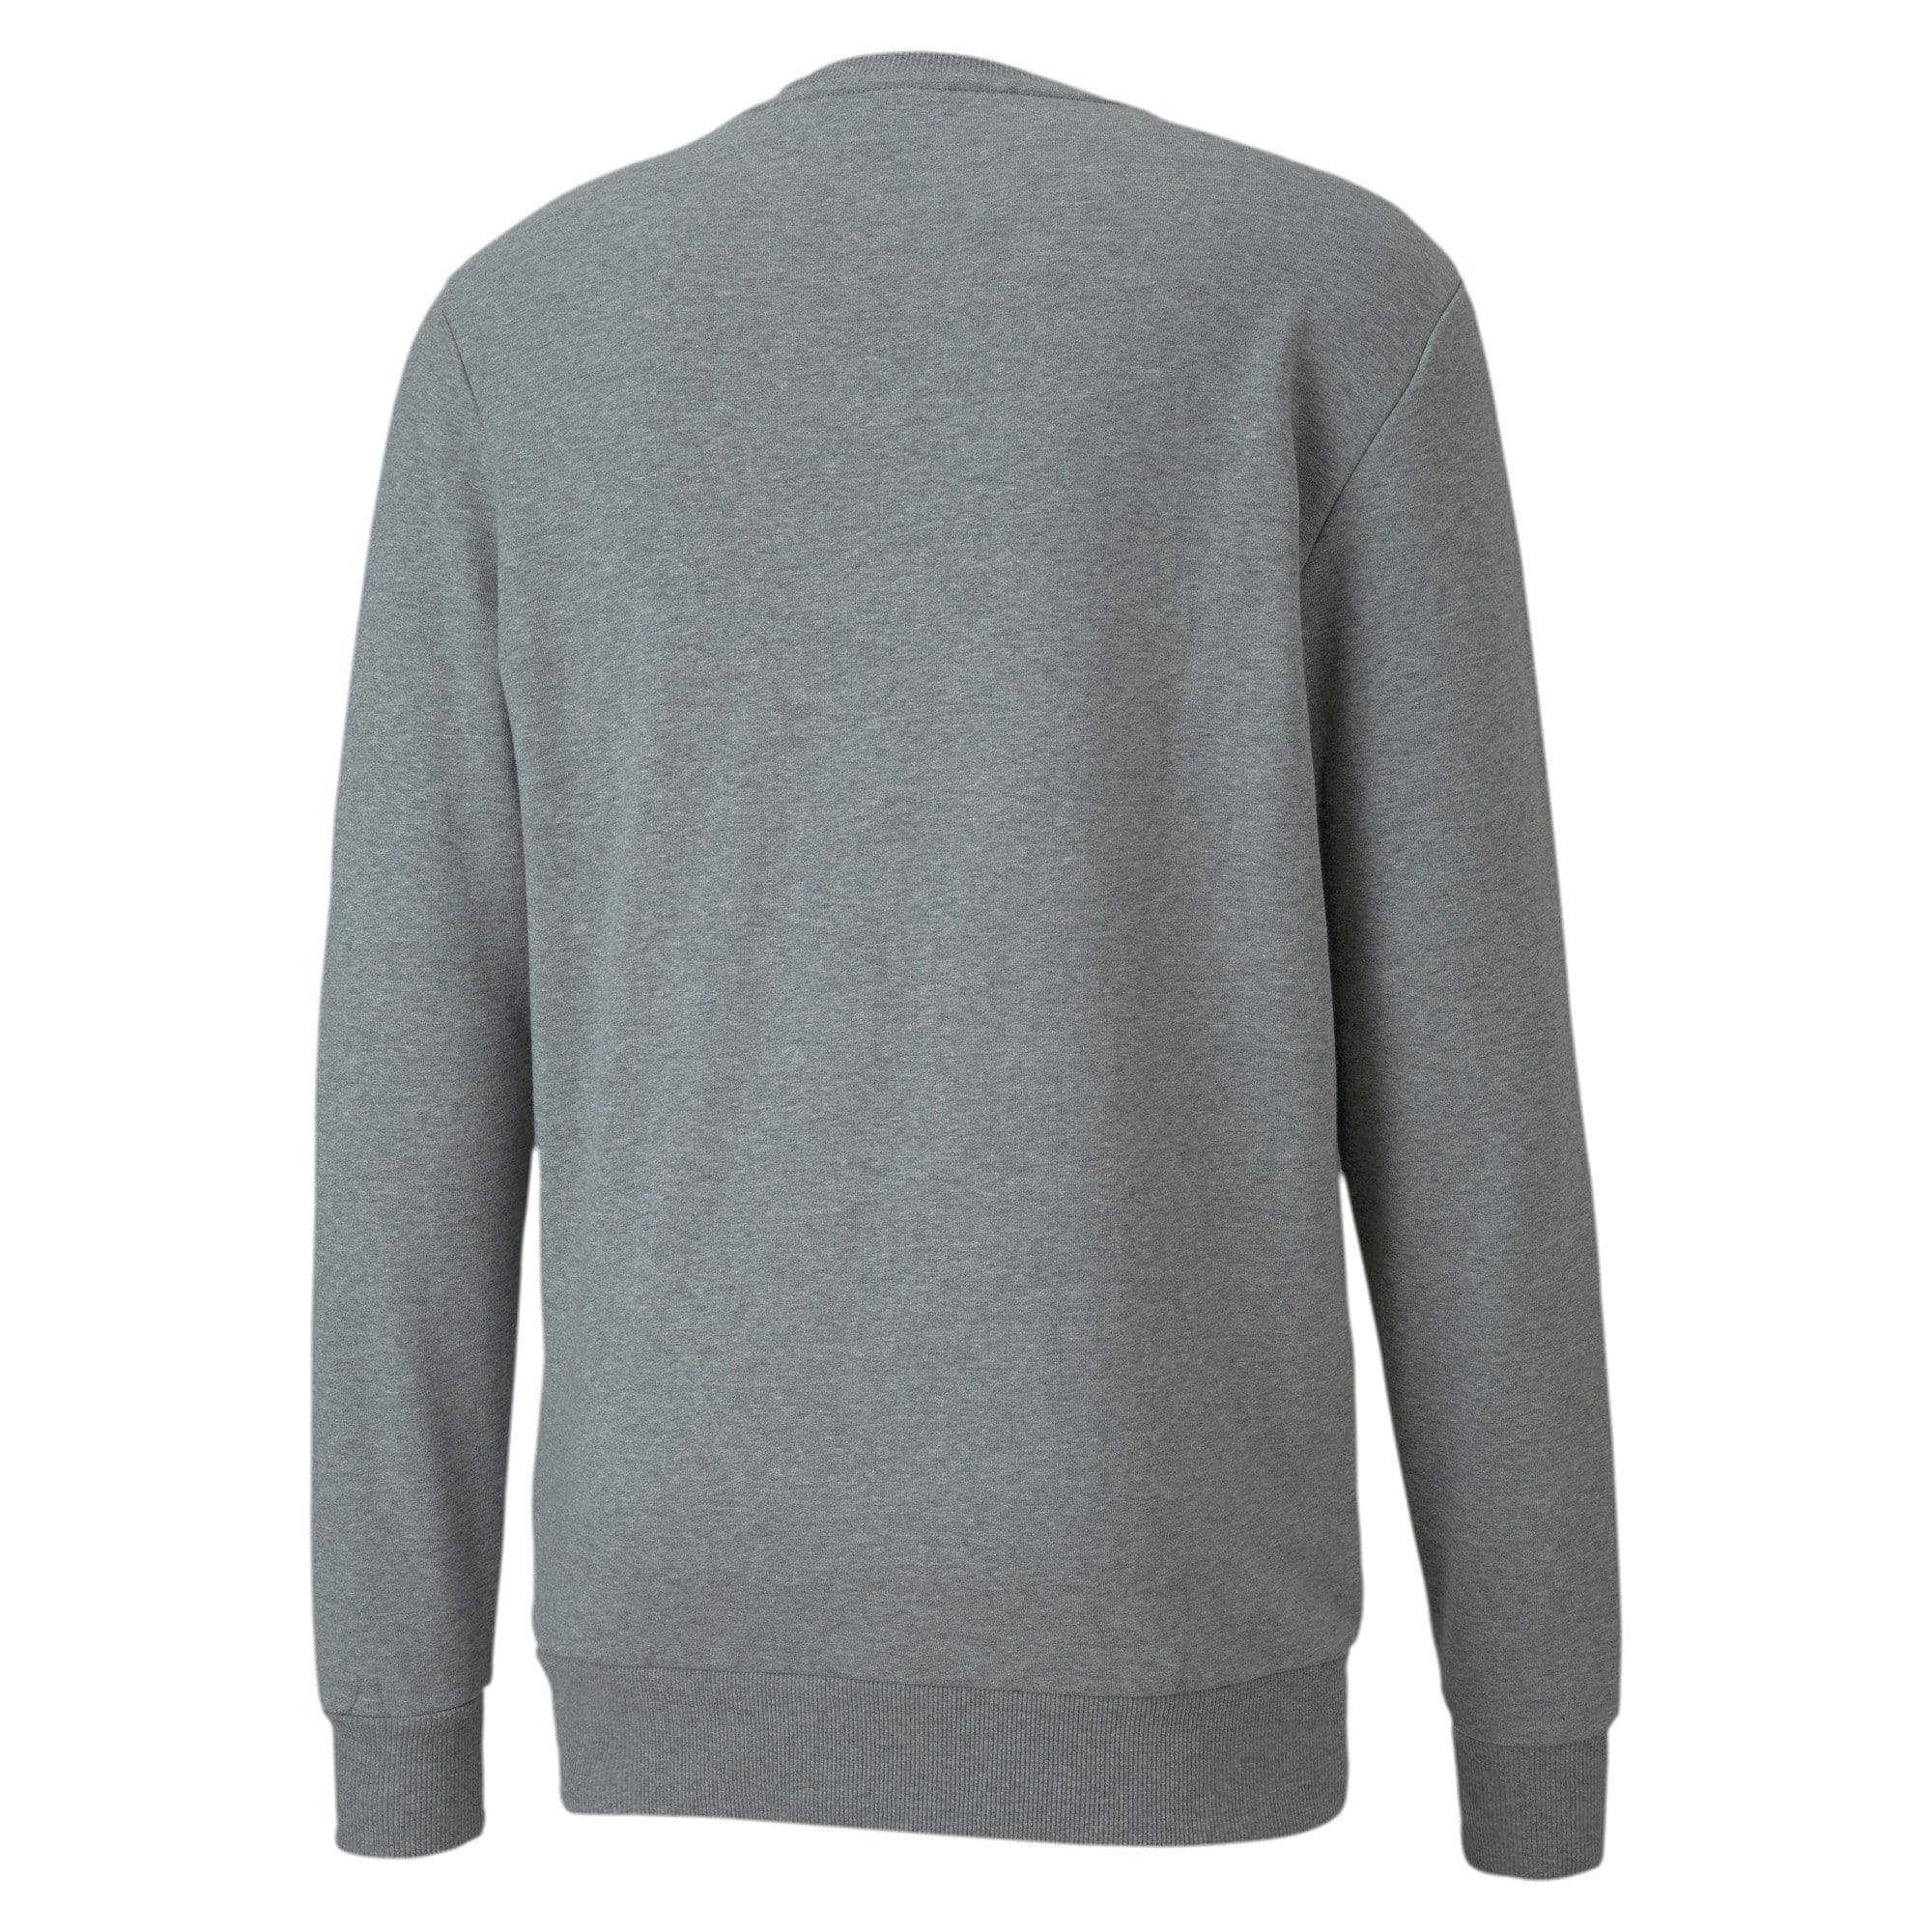 Thumbnail 5 of Classics Logo Men's Crewneck Sweatshirt, Medium Gray Heather, medium